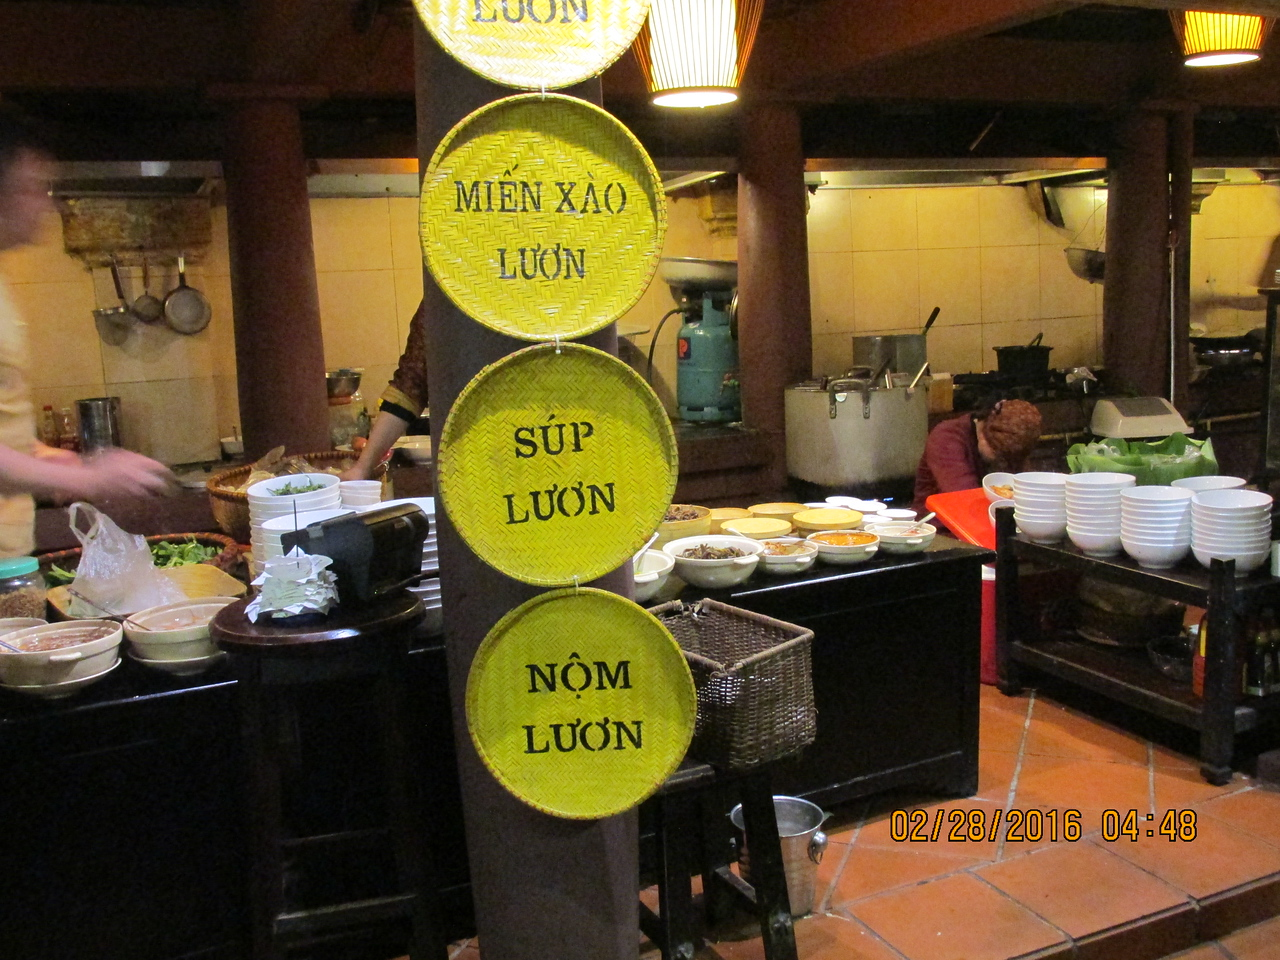 0063 - Quan An Ngon Restaurant on Phan Boi Chau - Hanoi Vietnam - Date Correct but Time on Pic is Wrong